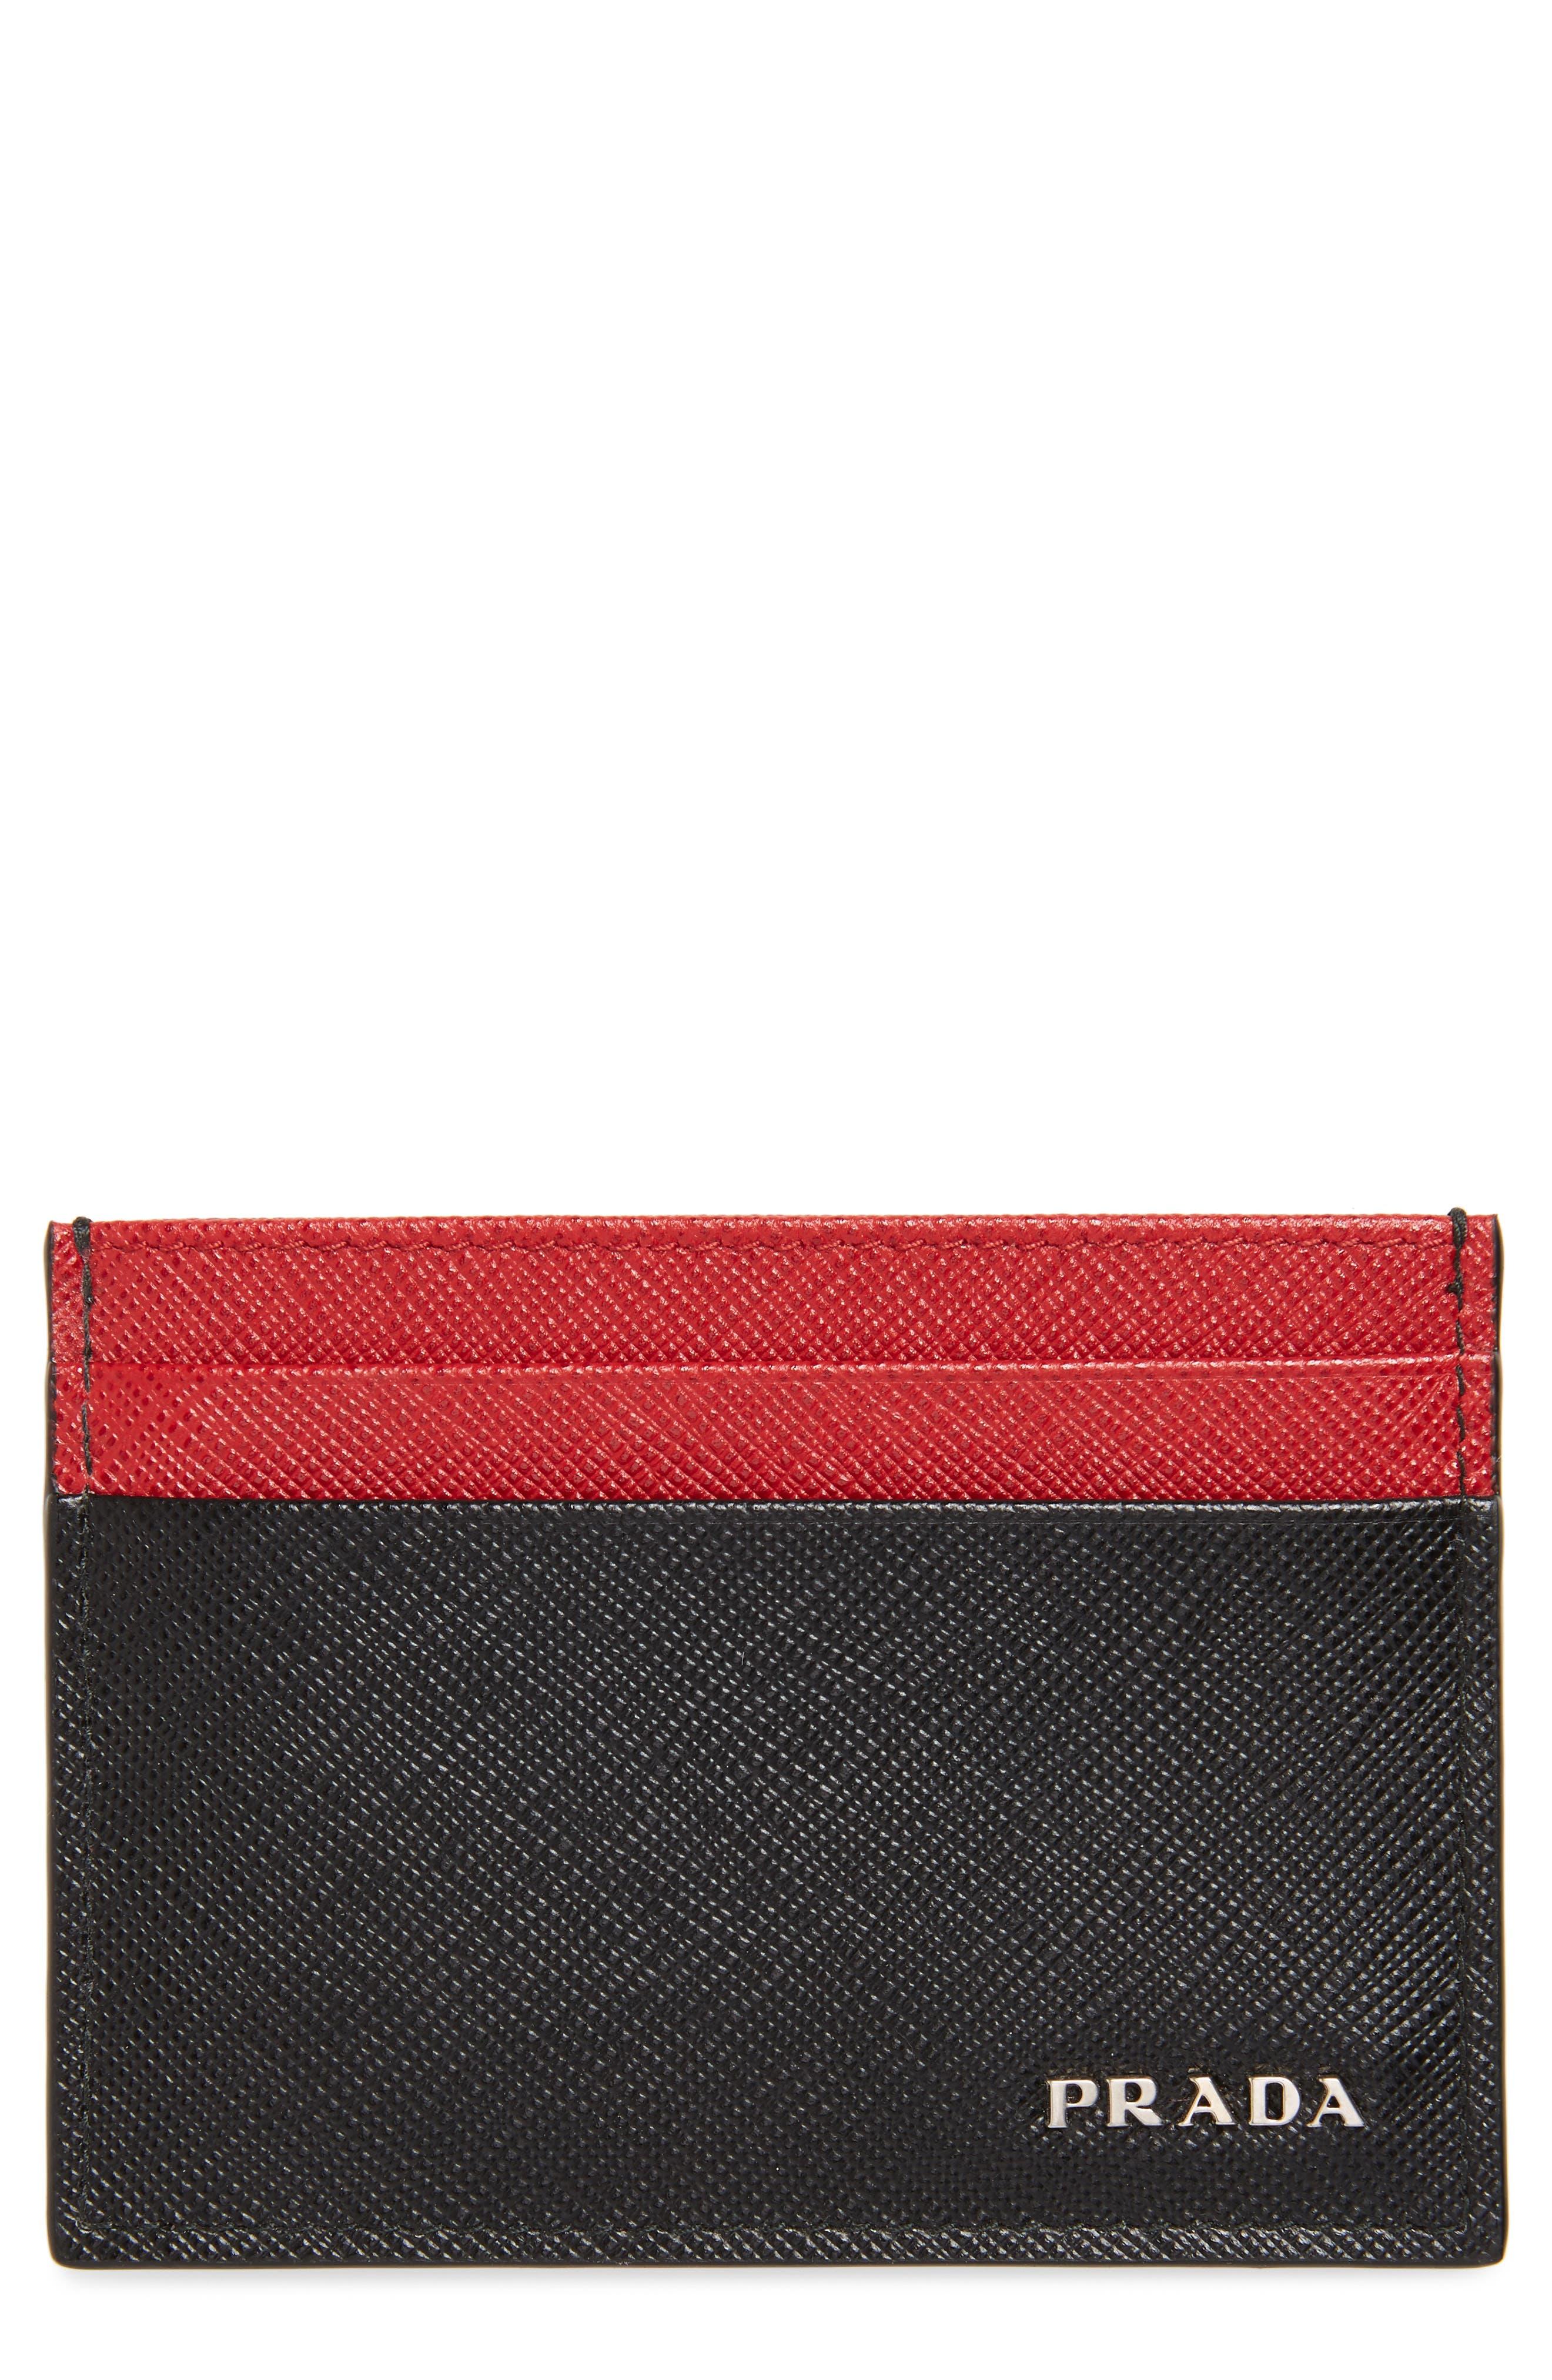 Bicolor Saffiano Leather Card Case,                             Main thumbnail 1, color,                             BLACK/ RED